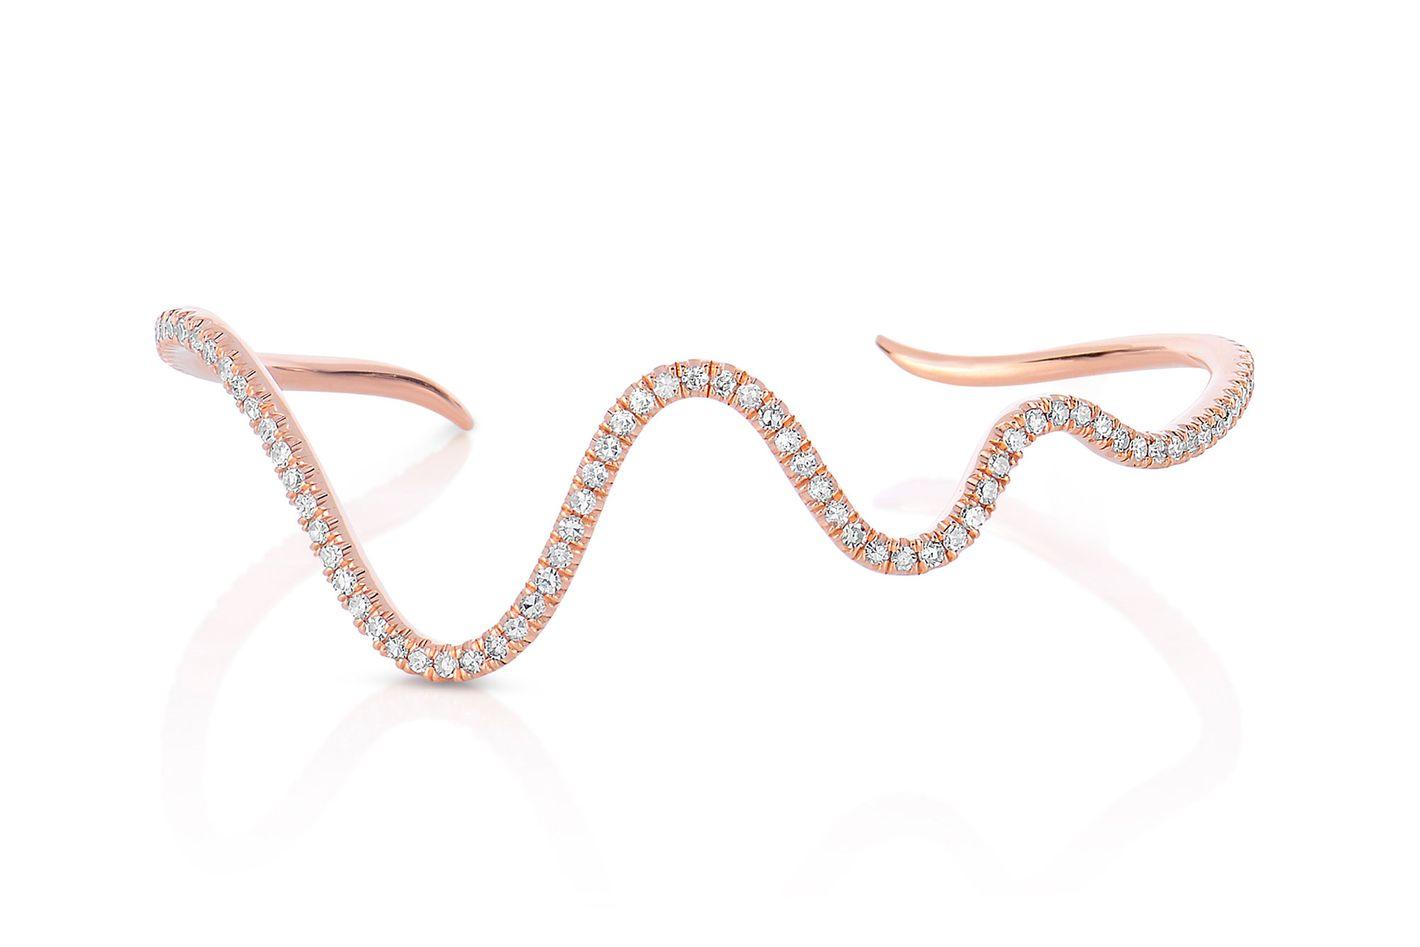 David Alan Jewelry